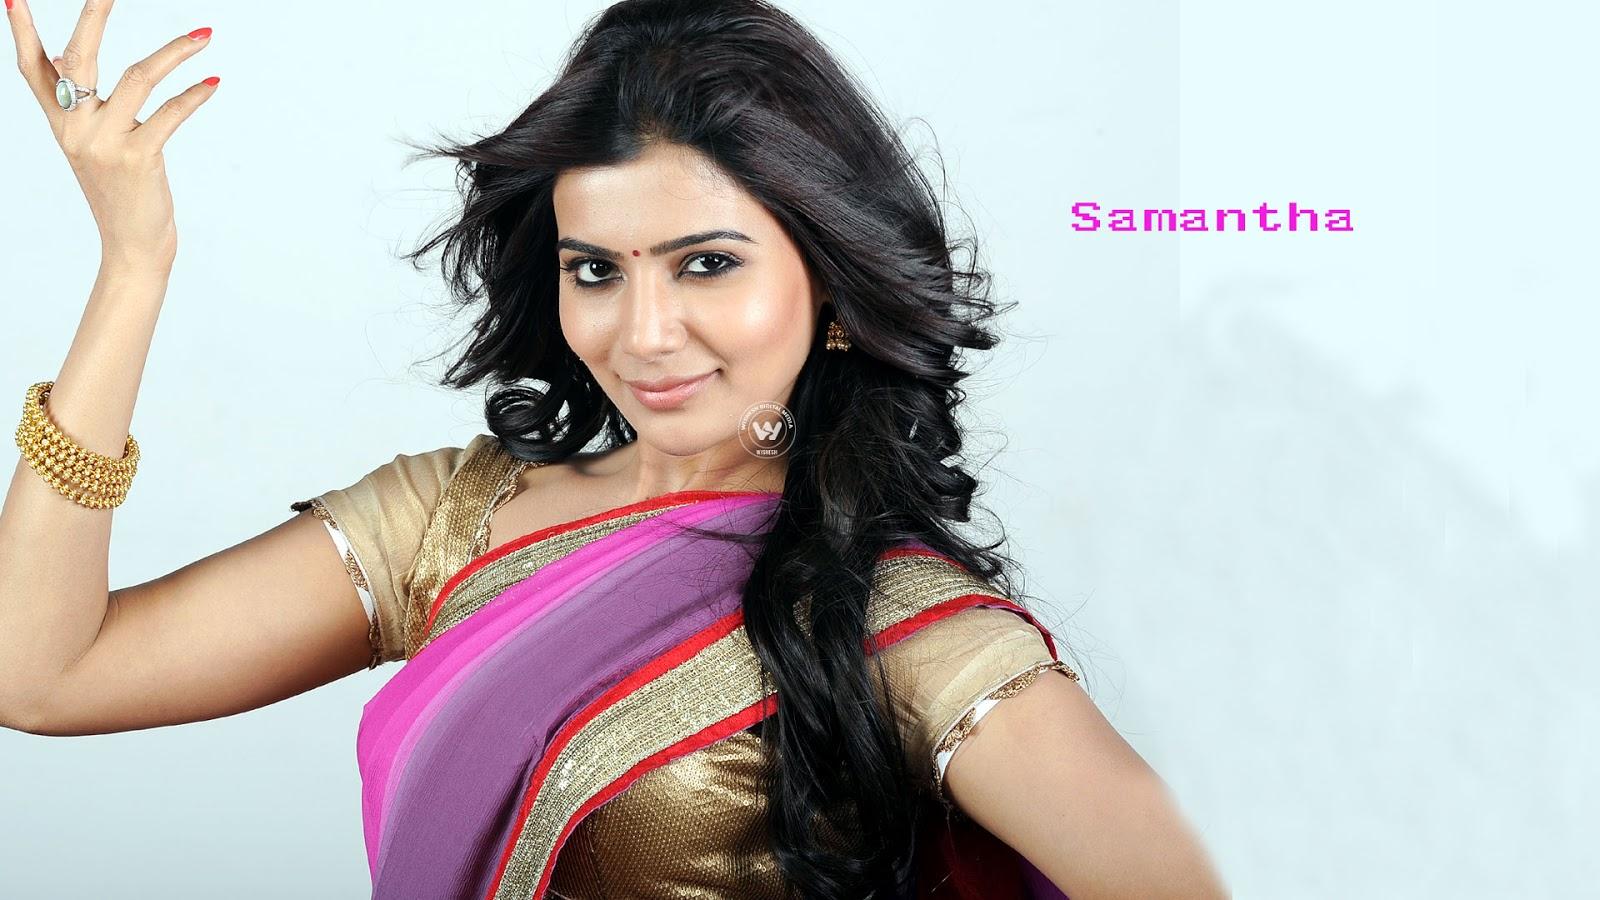 charming samantha hd wallpaper for desktop ~ beautiful celebrity